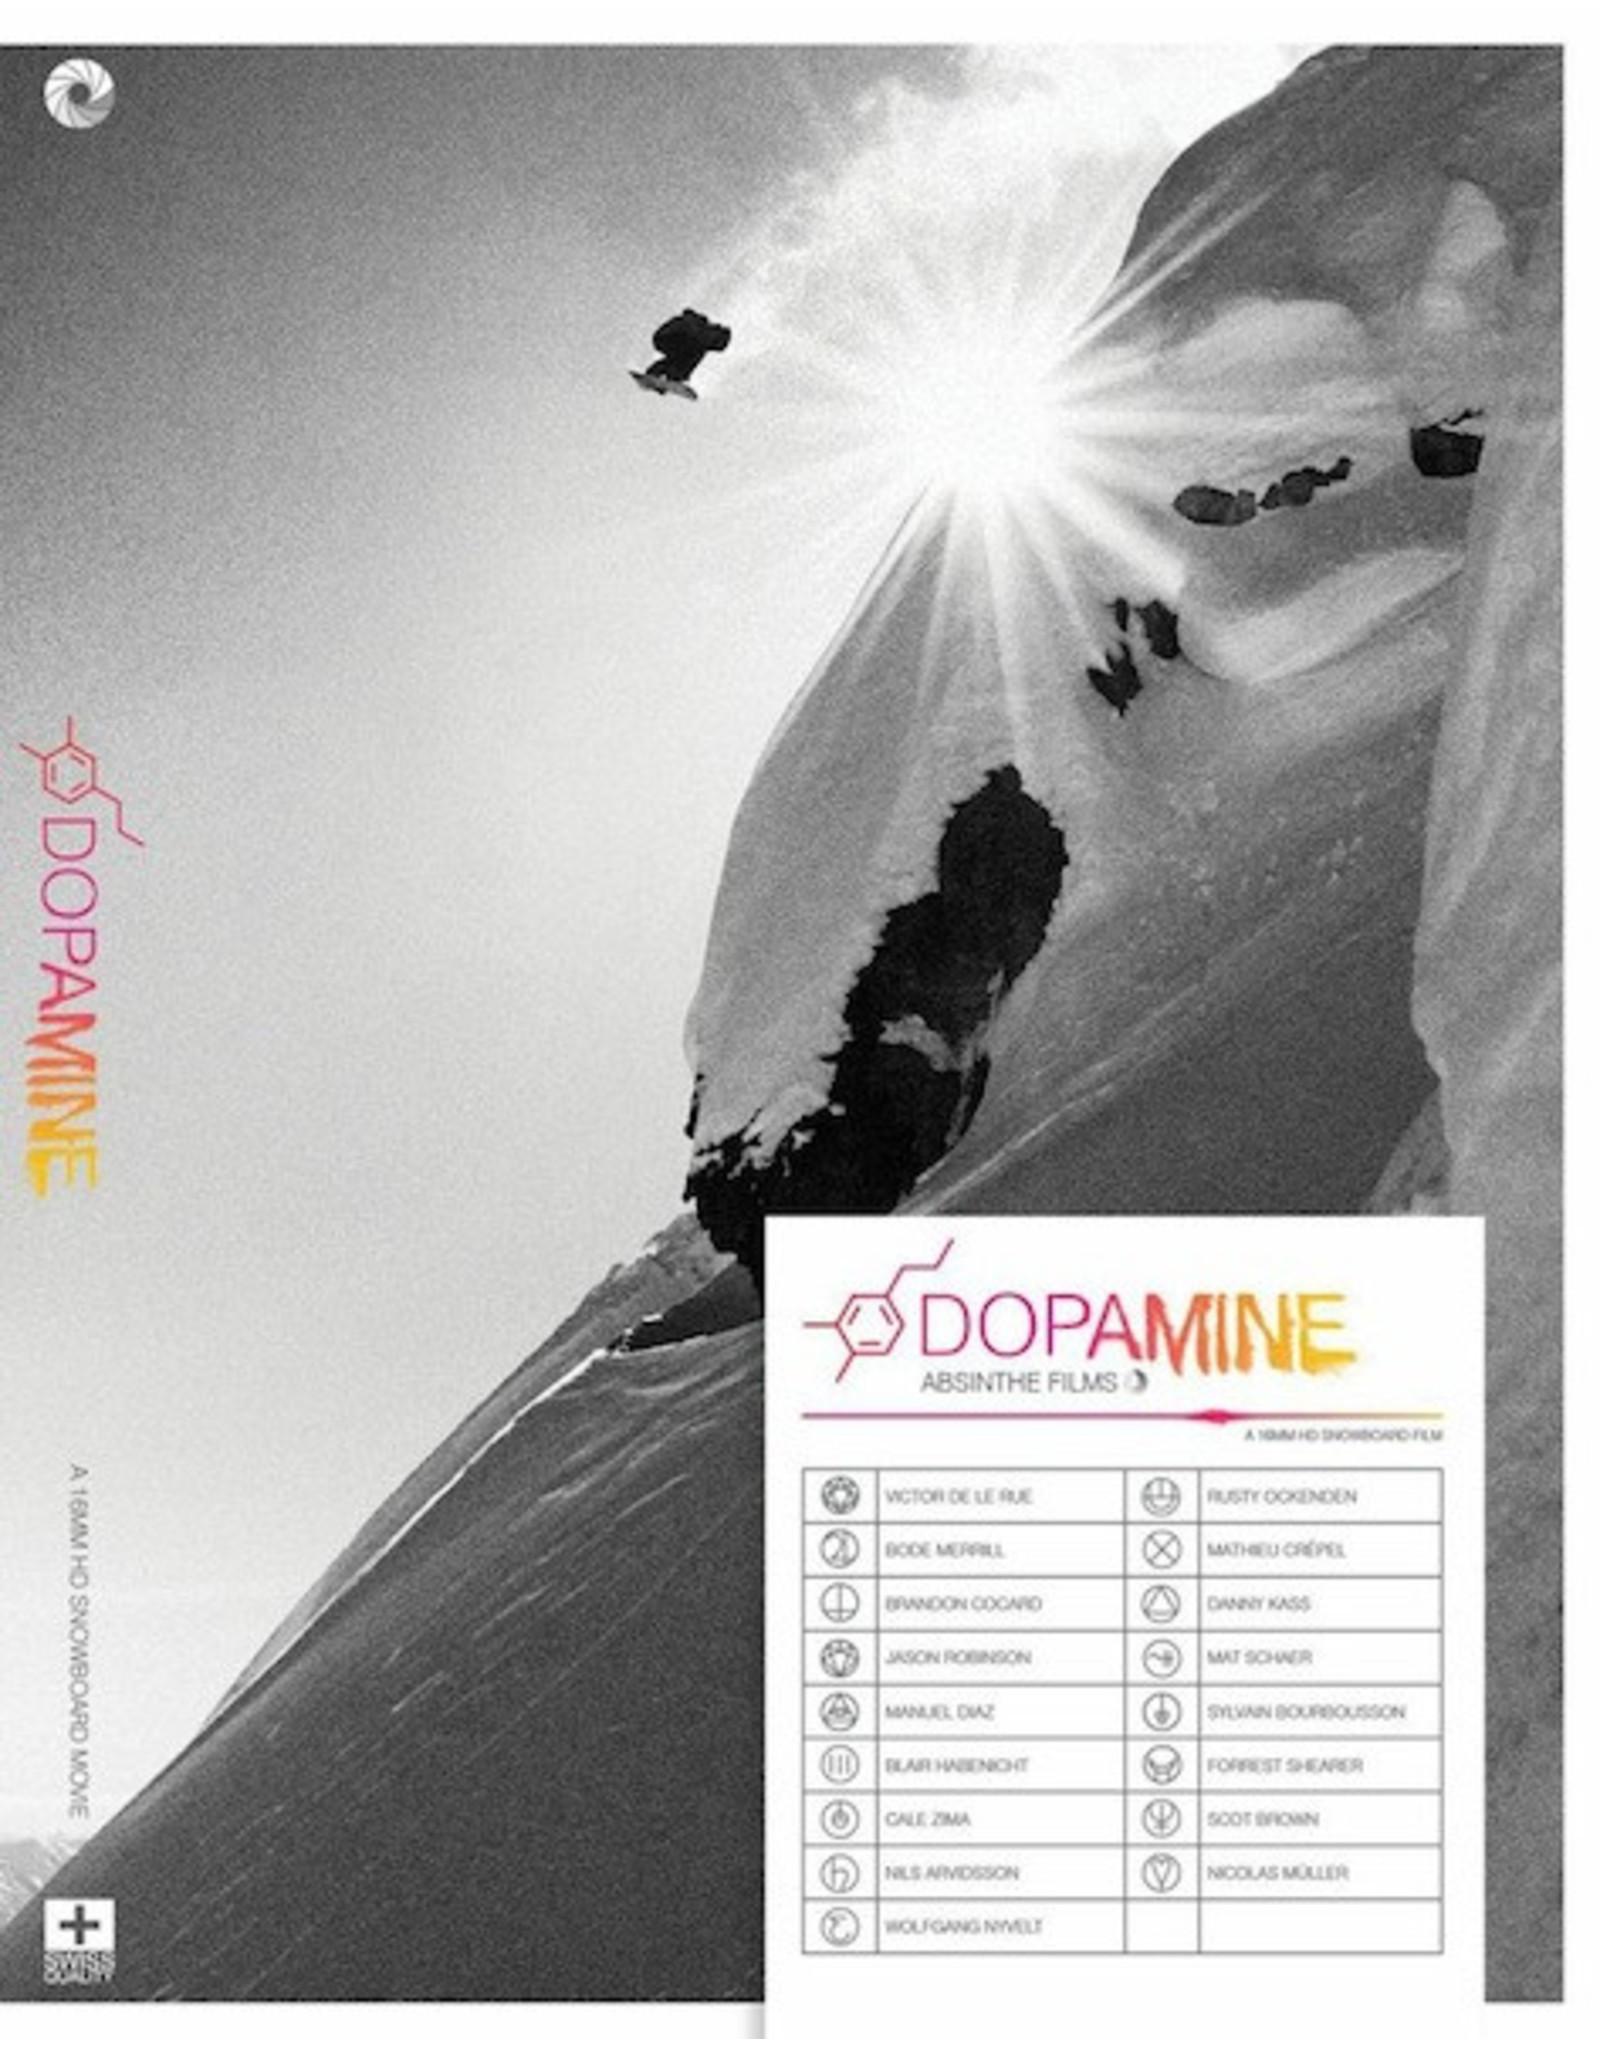 DVD Dopamine, Absinthe Films (Blu-ray/DVD)